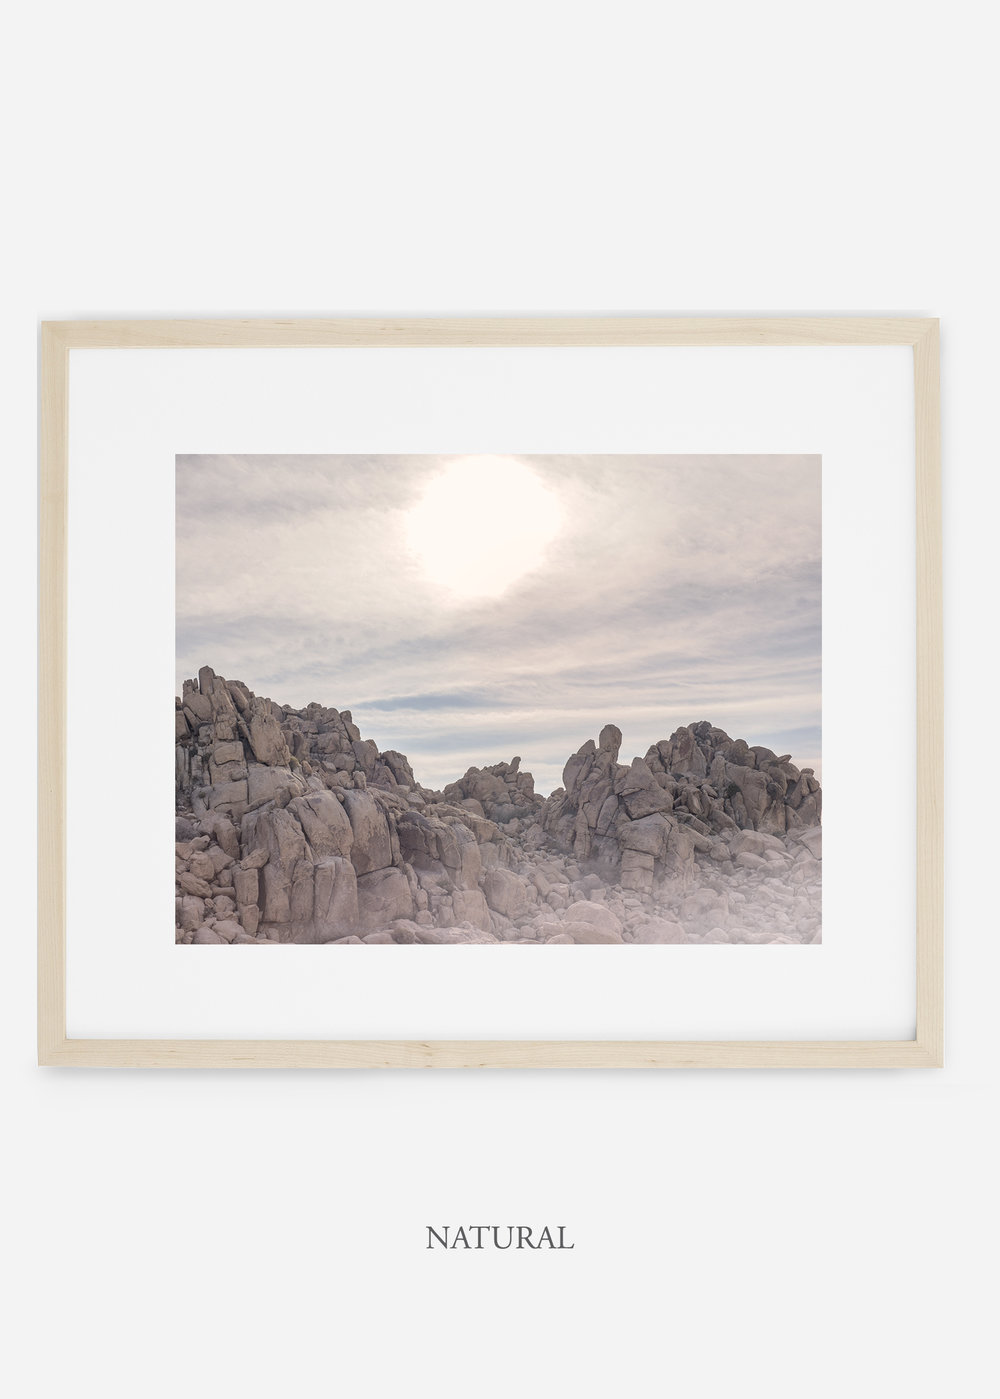 WilderCalifornia_naturalframe_JoshuaTree_Rocks_No.3_interiordesign_desert_art.jpg